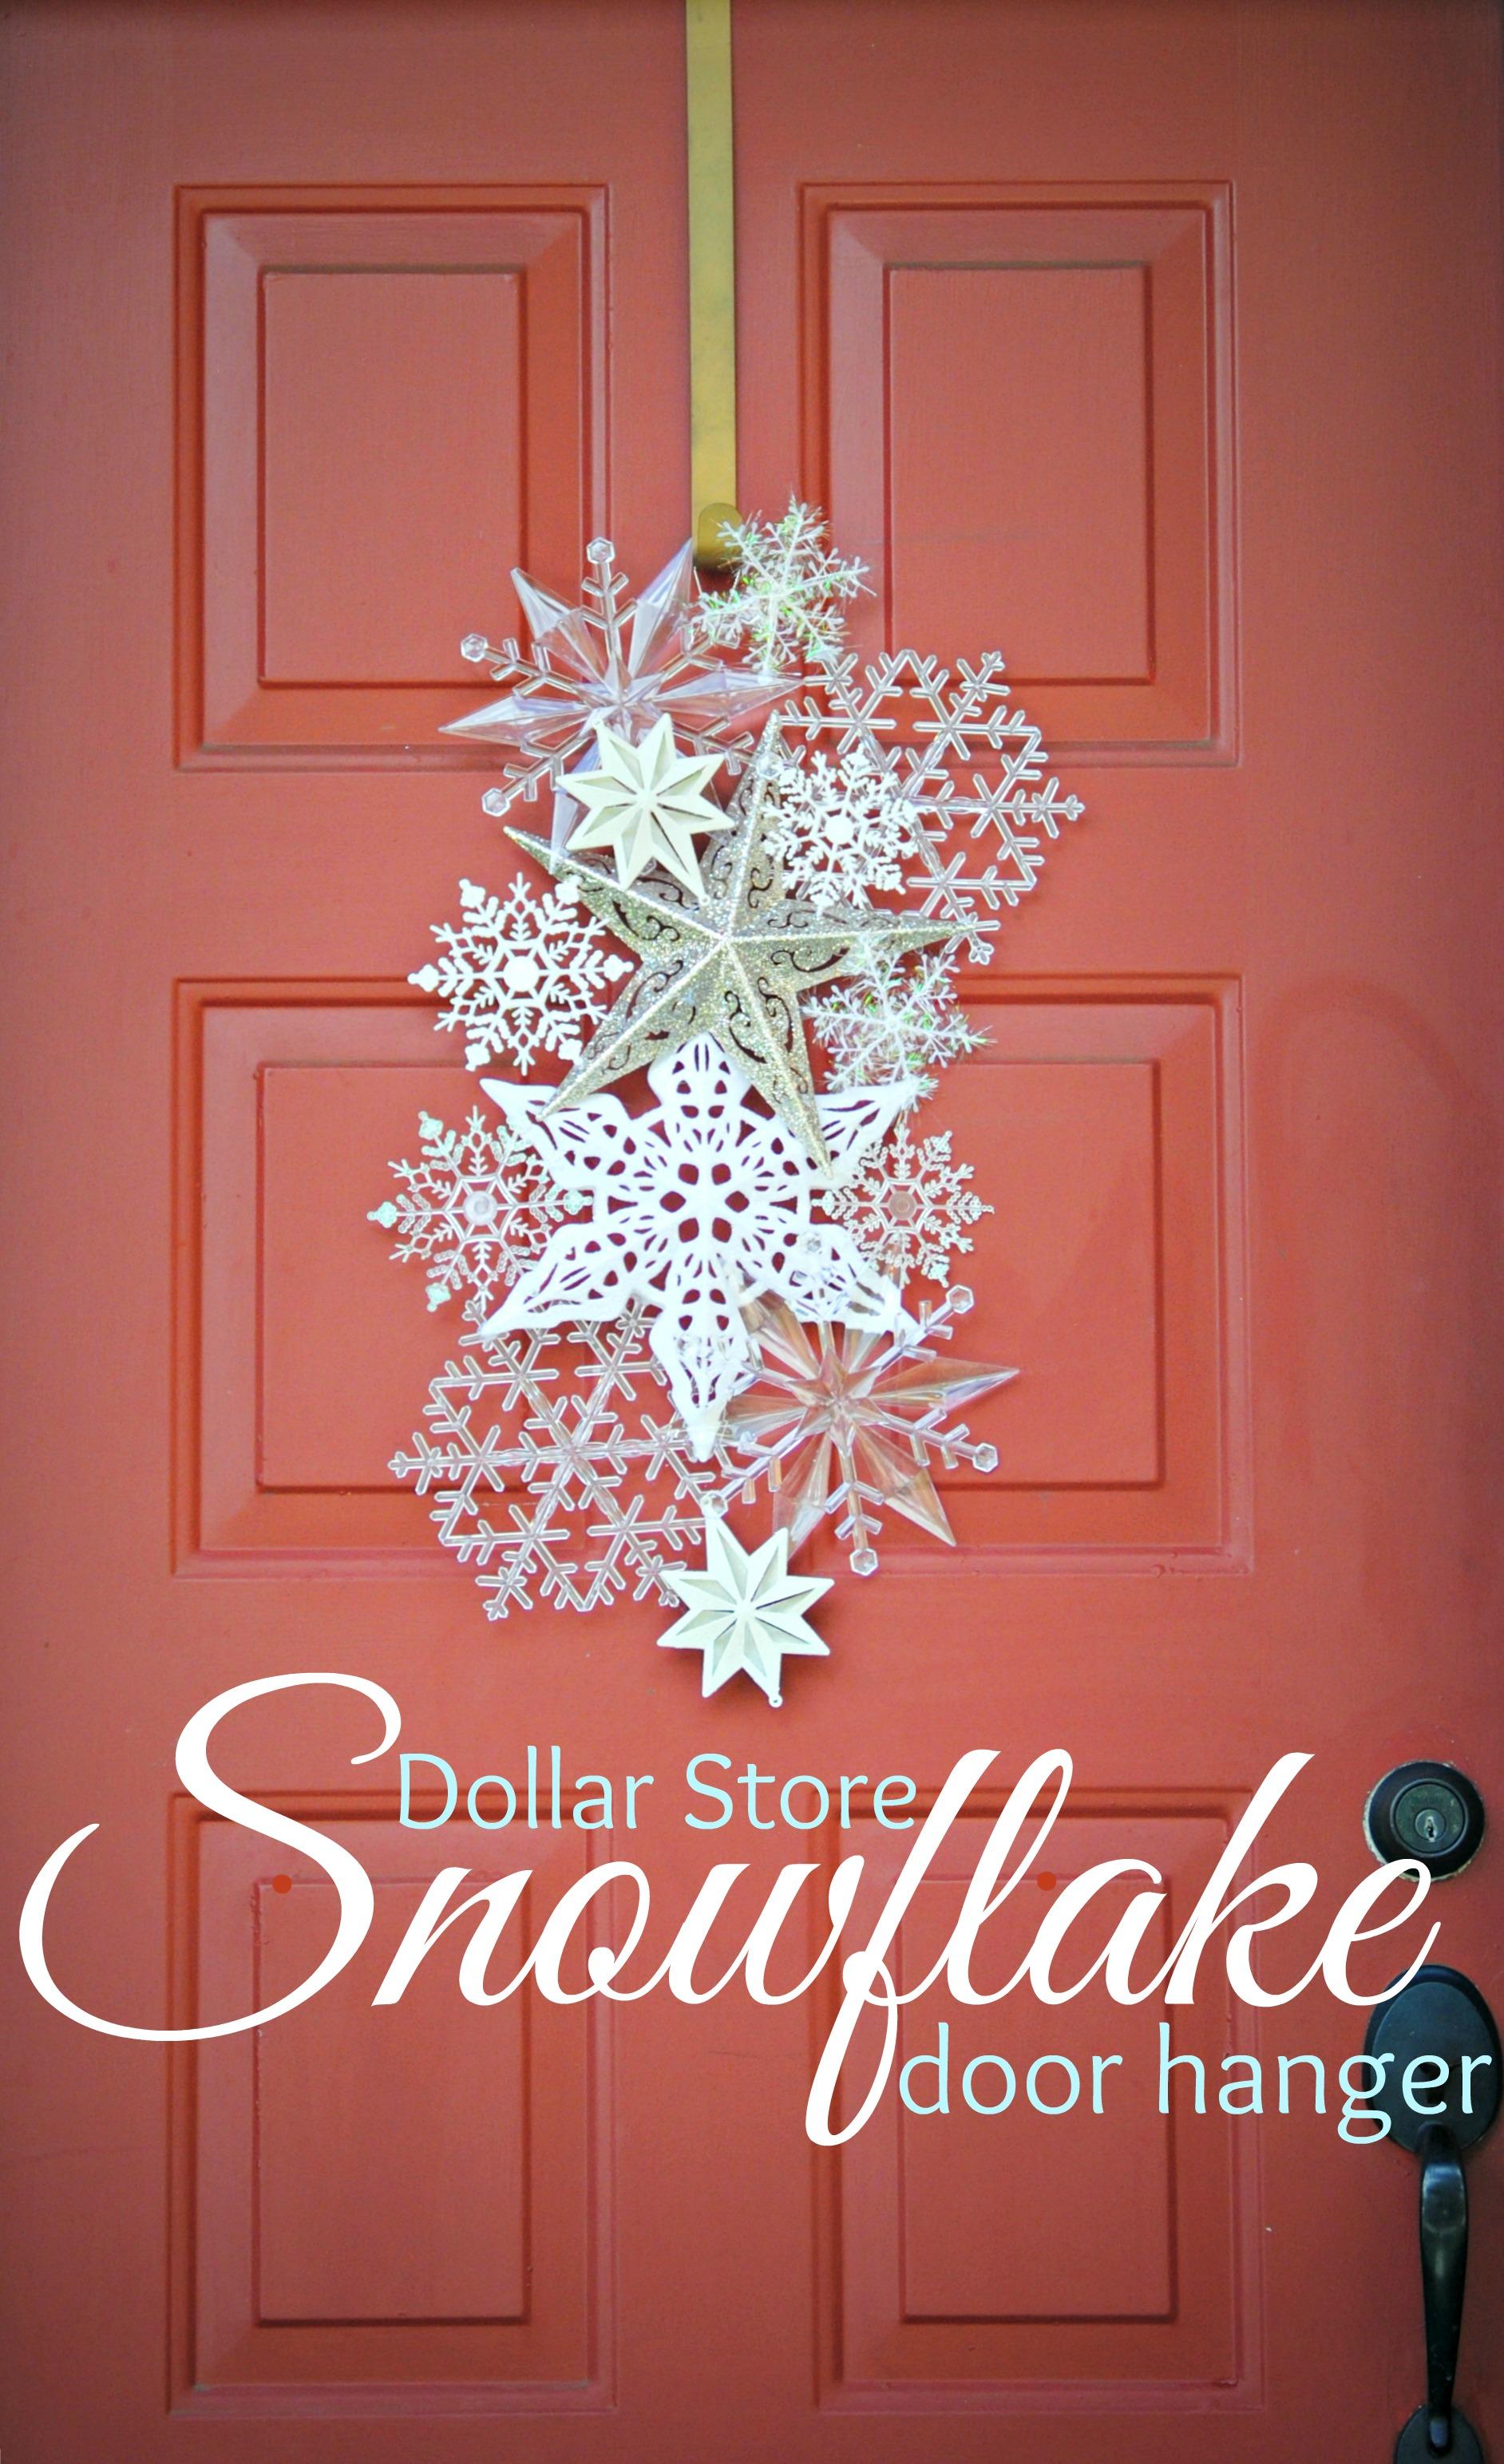 dollar store snowflake door hanger - Dollar Tree Hours Christmas Eve